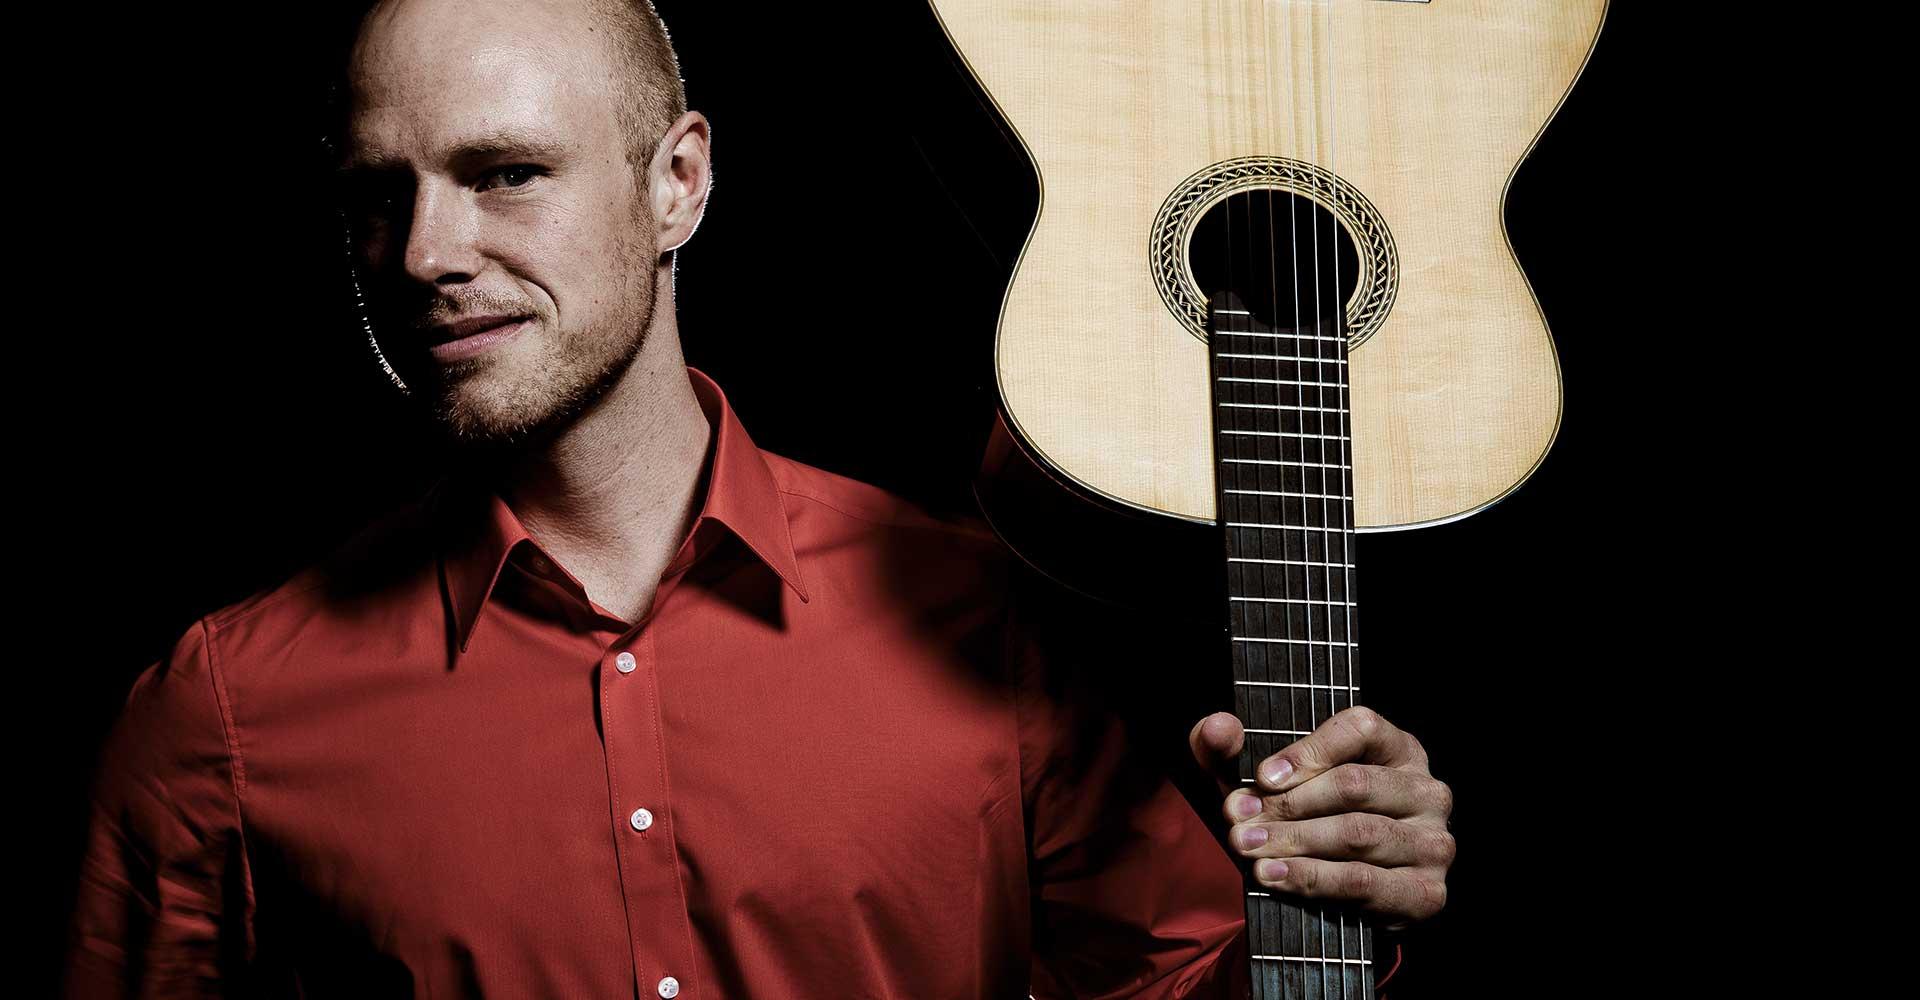 Gitarrenunterricht in Berlin - Herzlich willkommen